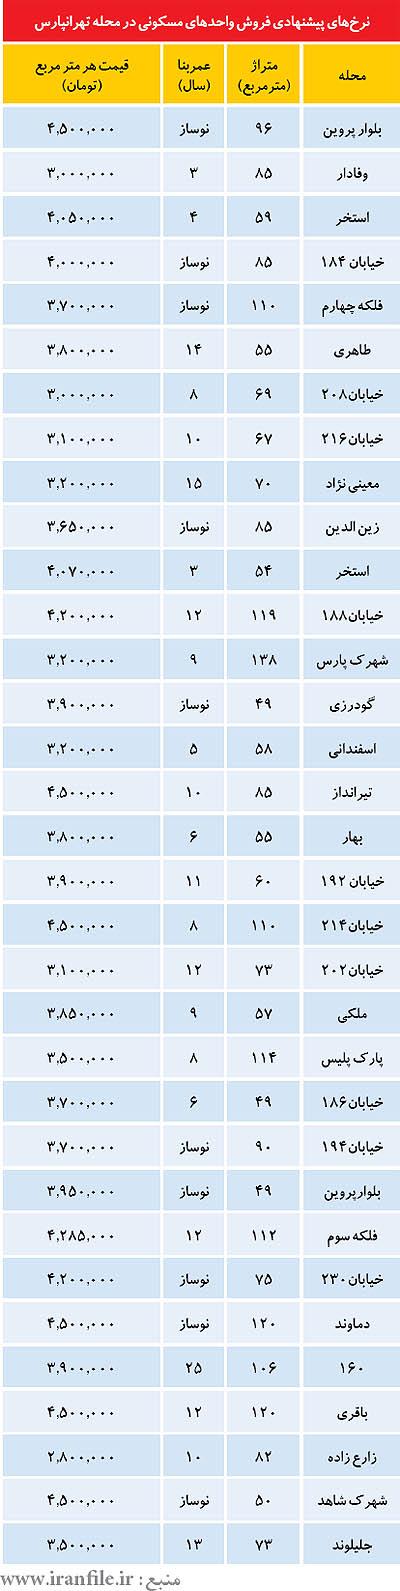 فروش آپارتمان در تهران تهرانپارس